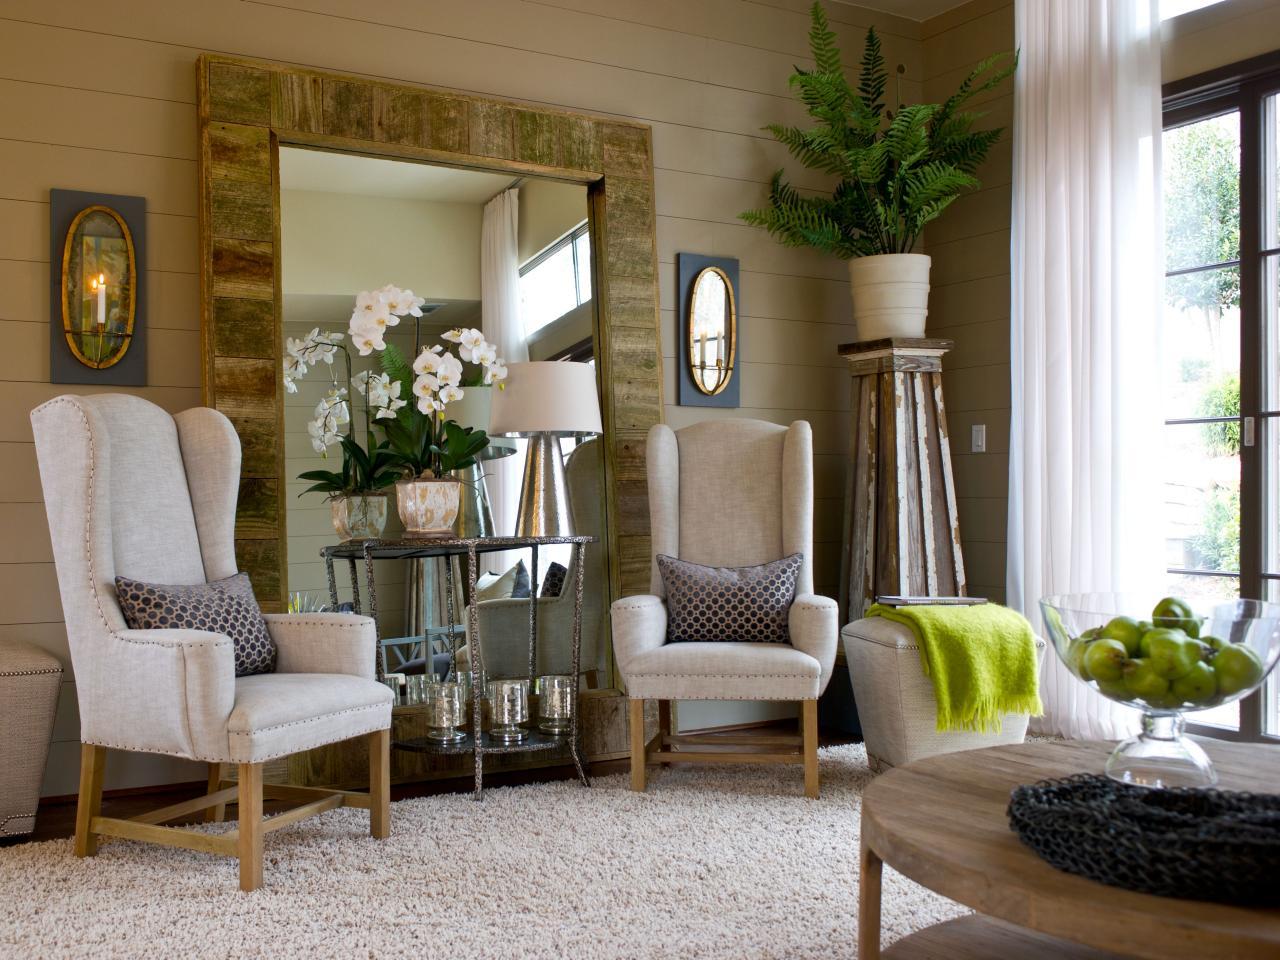 gh2012_salon-15-chaises-miroir-cour-epp4867_s4x3-jpg-rend-hgtvcom-1280-960